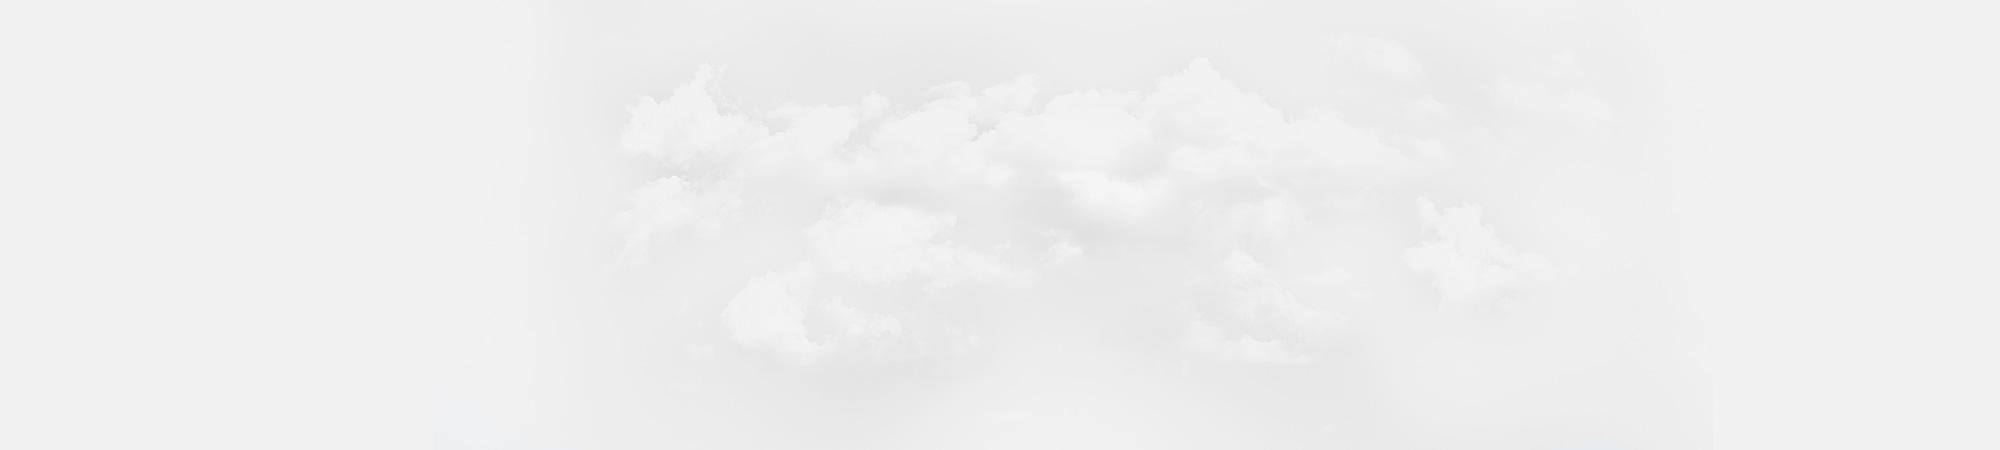 clouds-slide